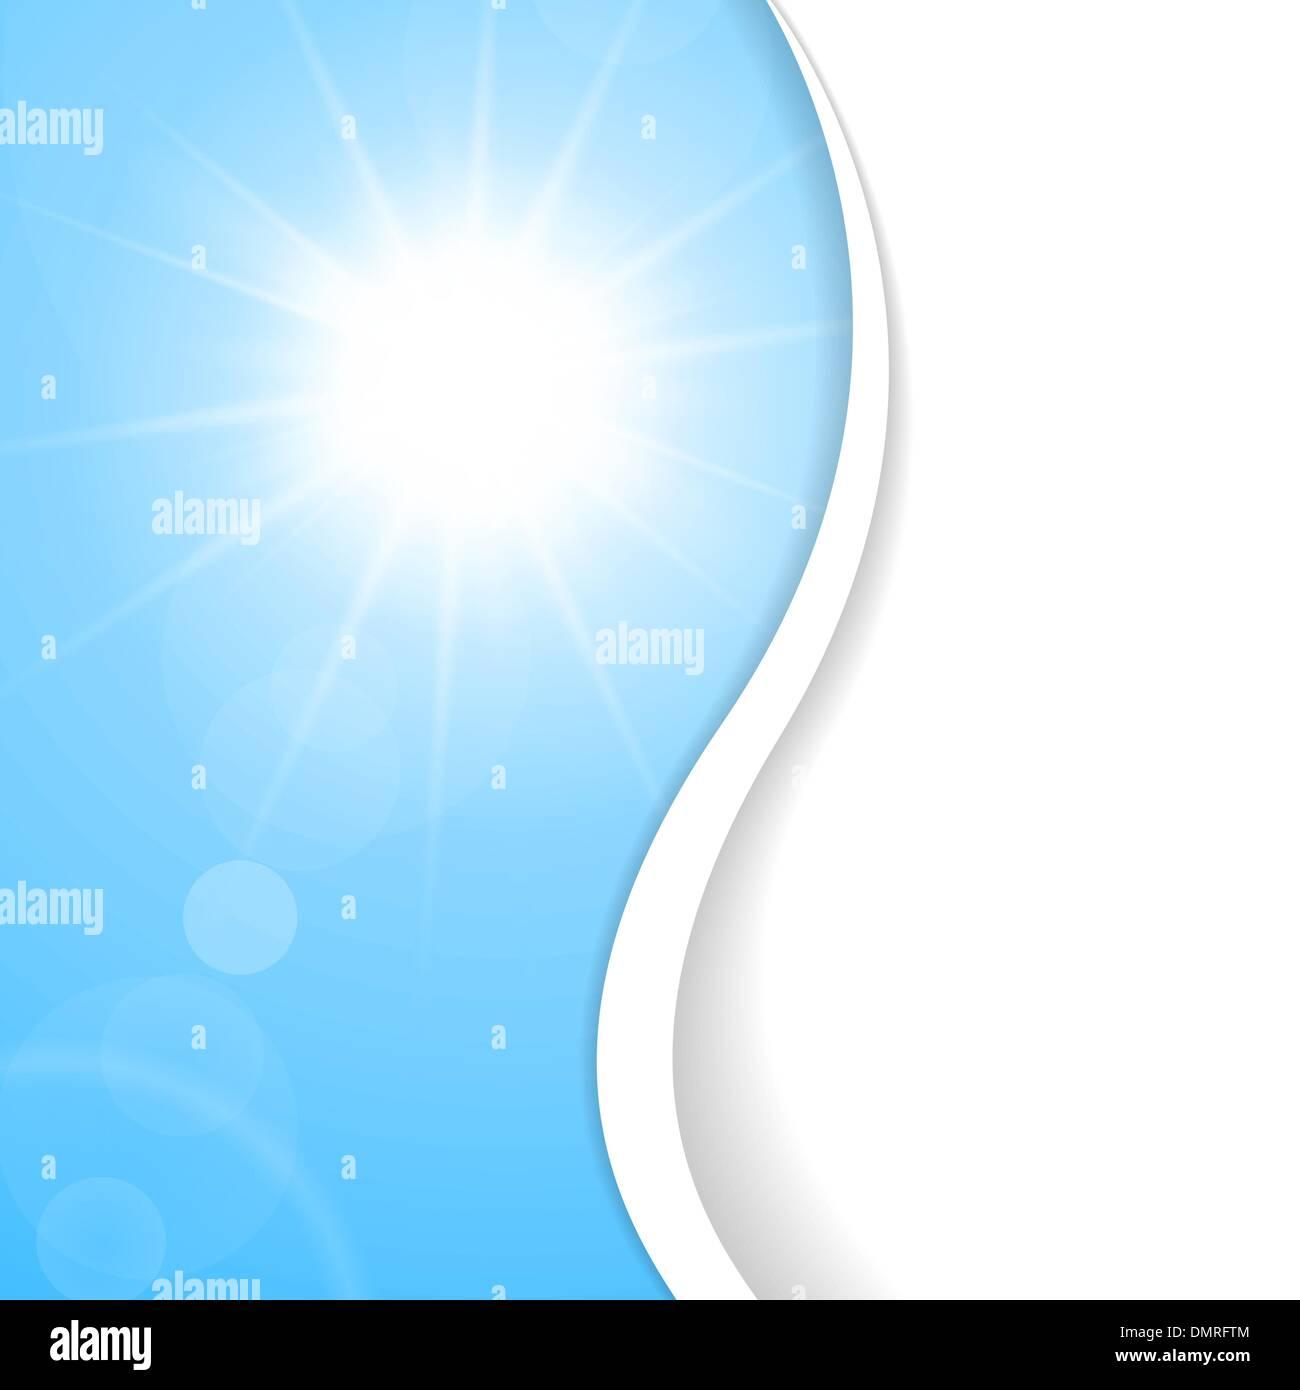 Verano Azul de fondo con lugar para tu contenido Imagen De Stock